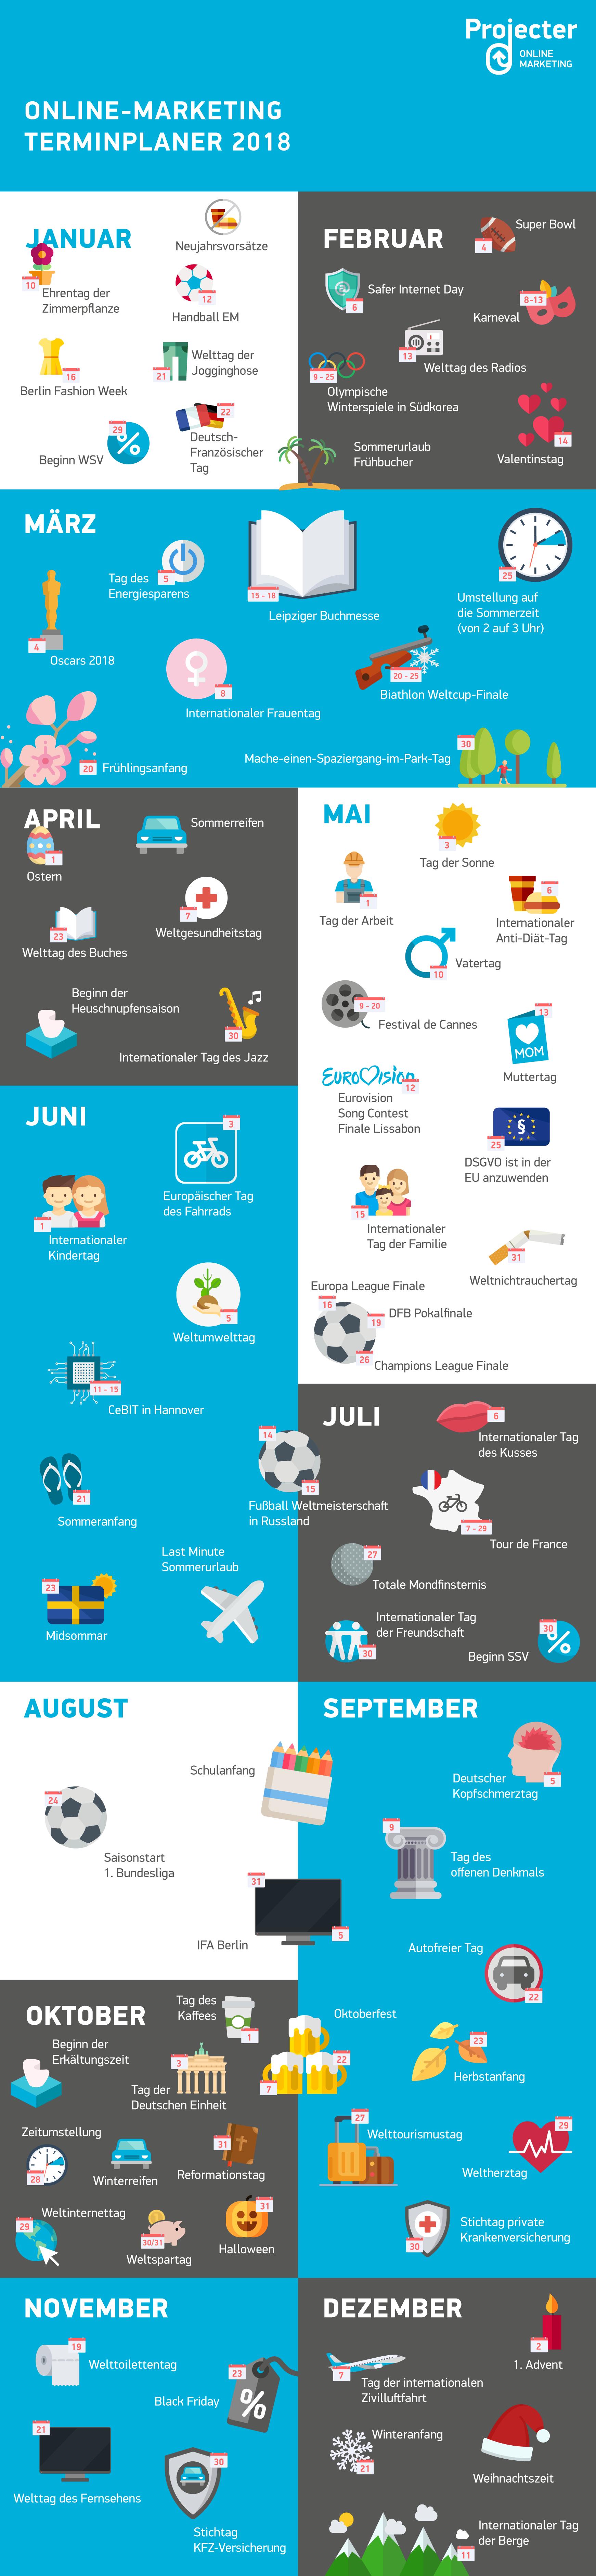 Online Marketing Kalender 2018